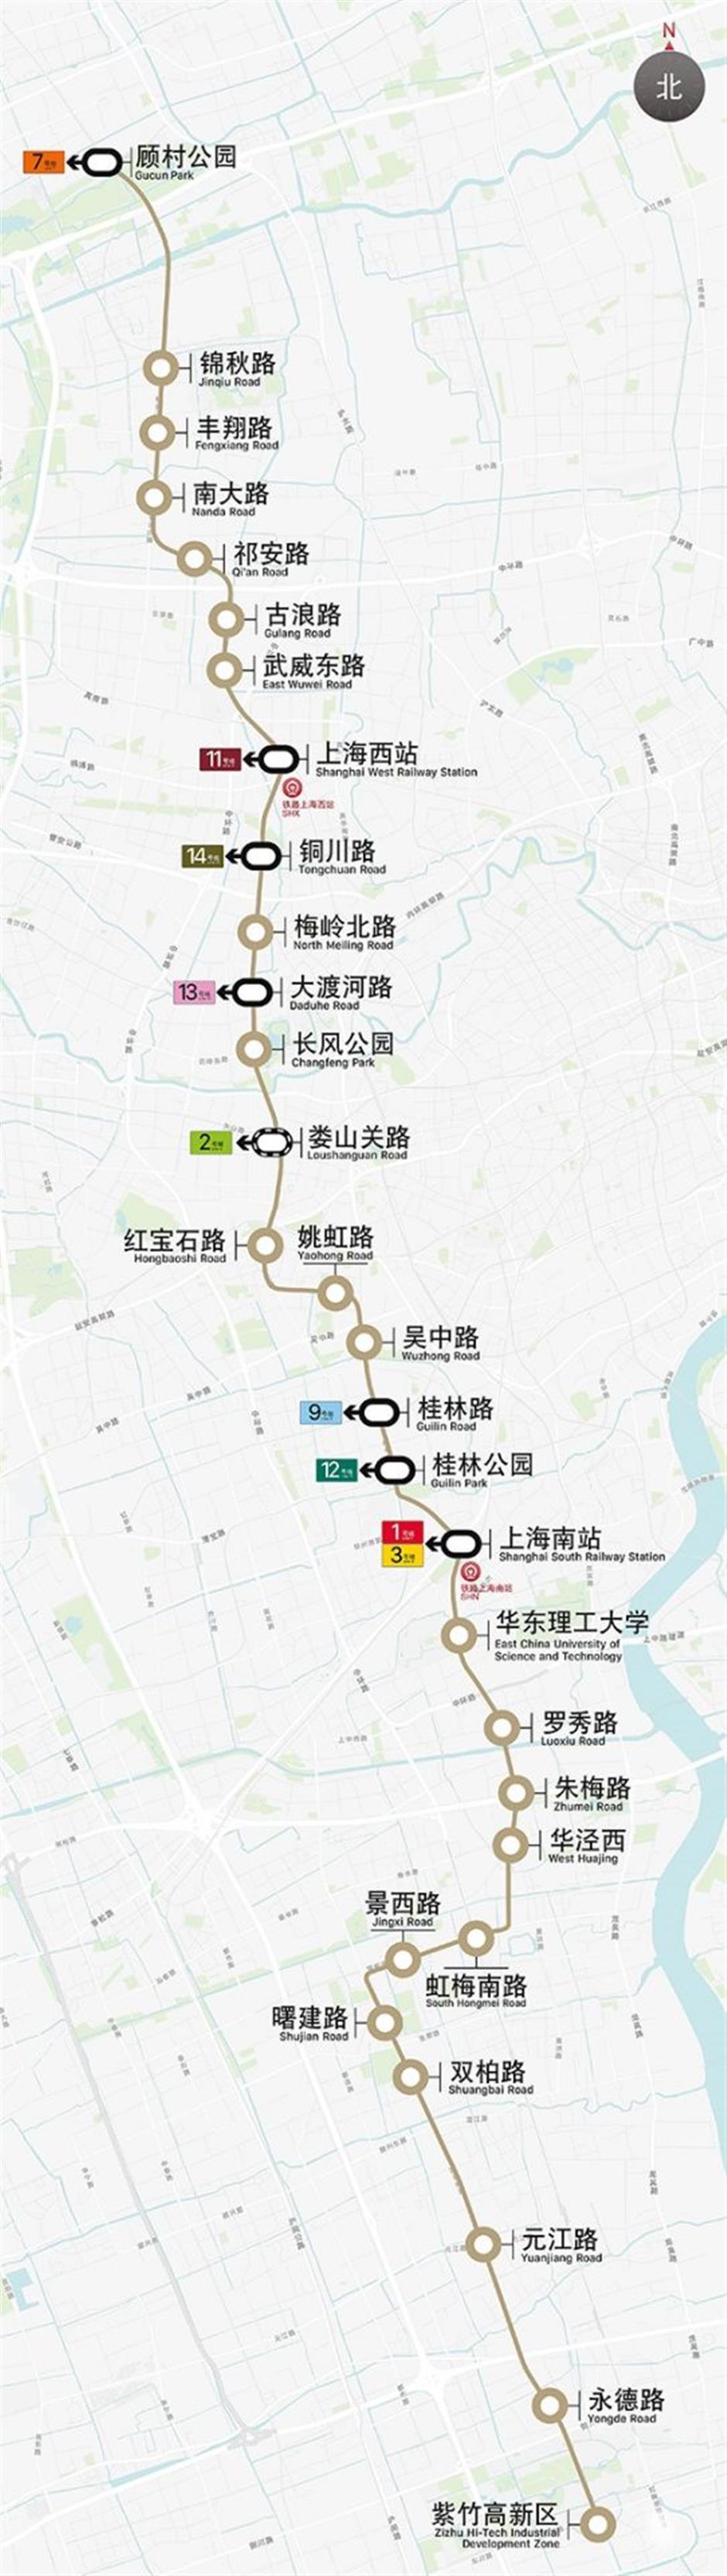 Worlds largest subway system set to expand